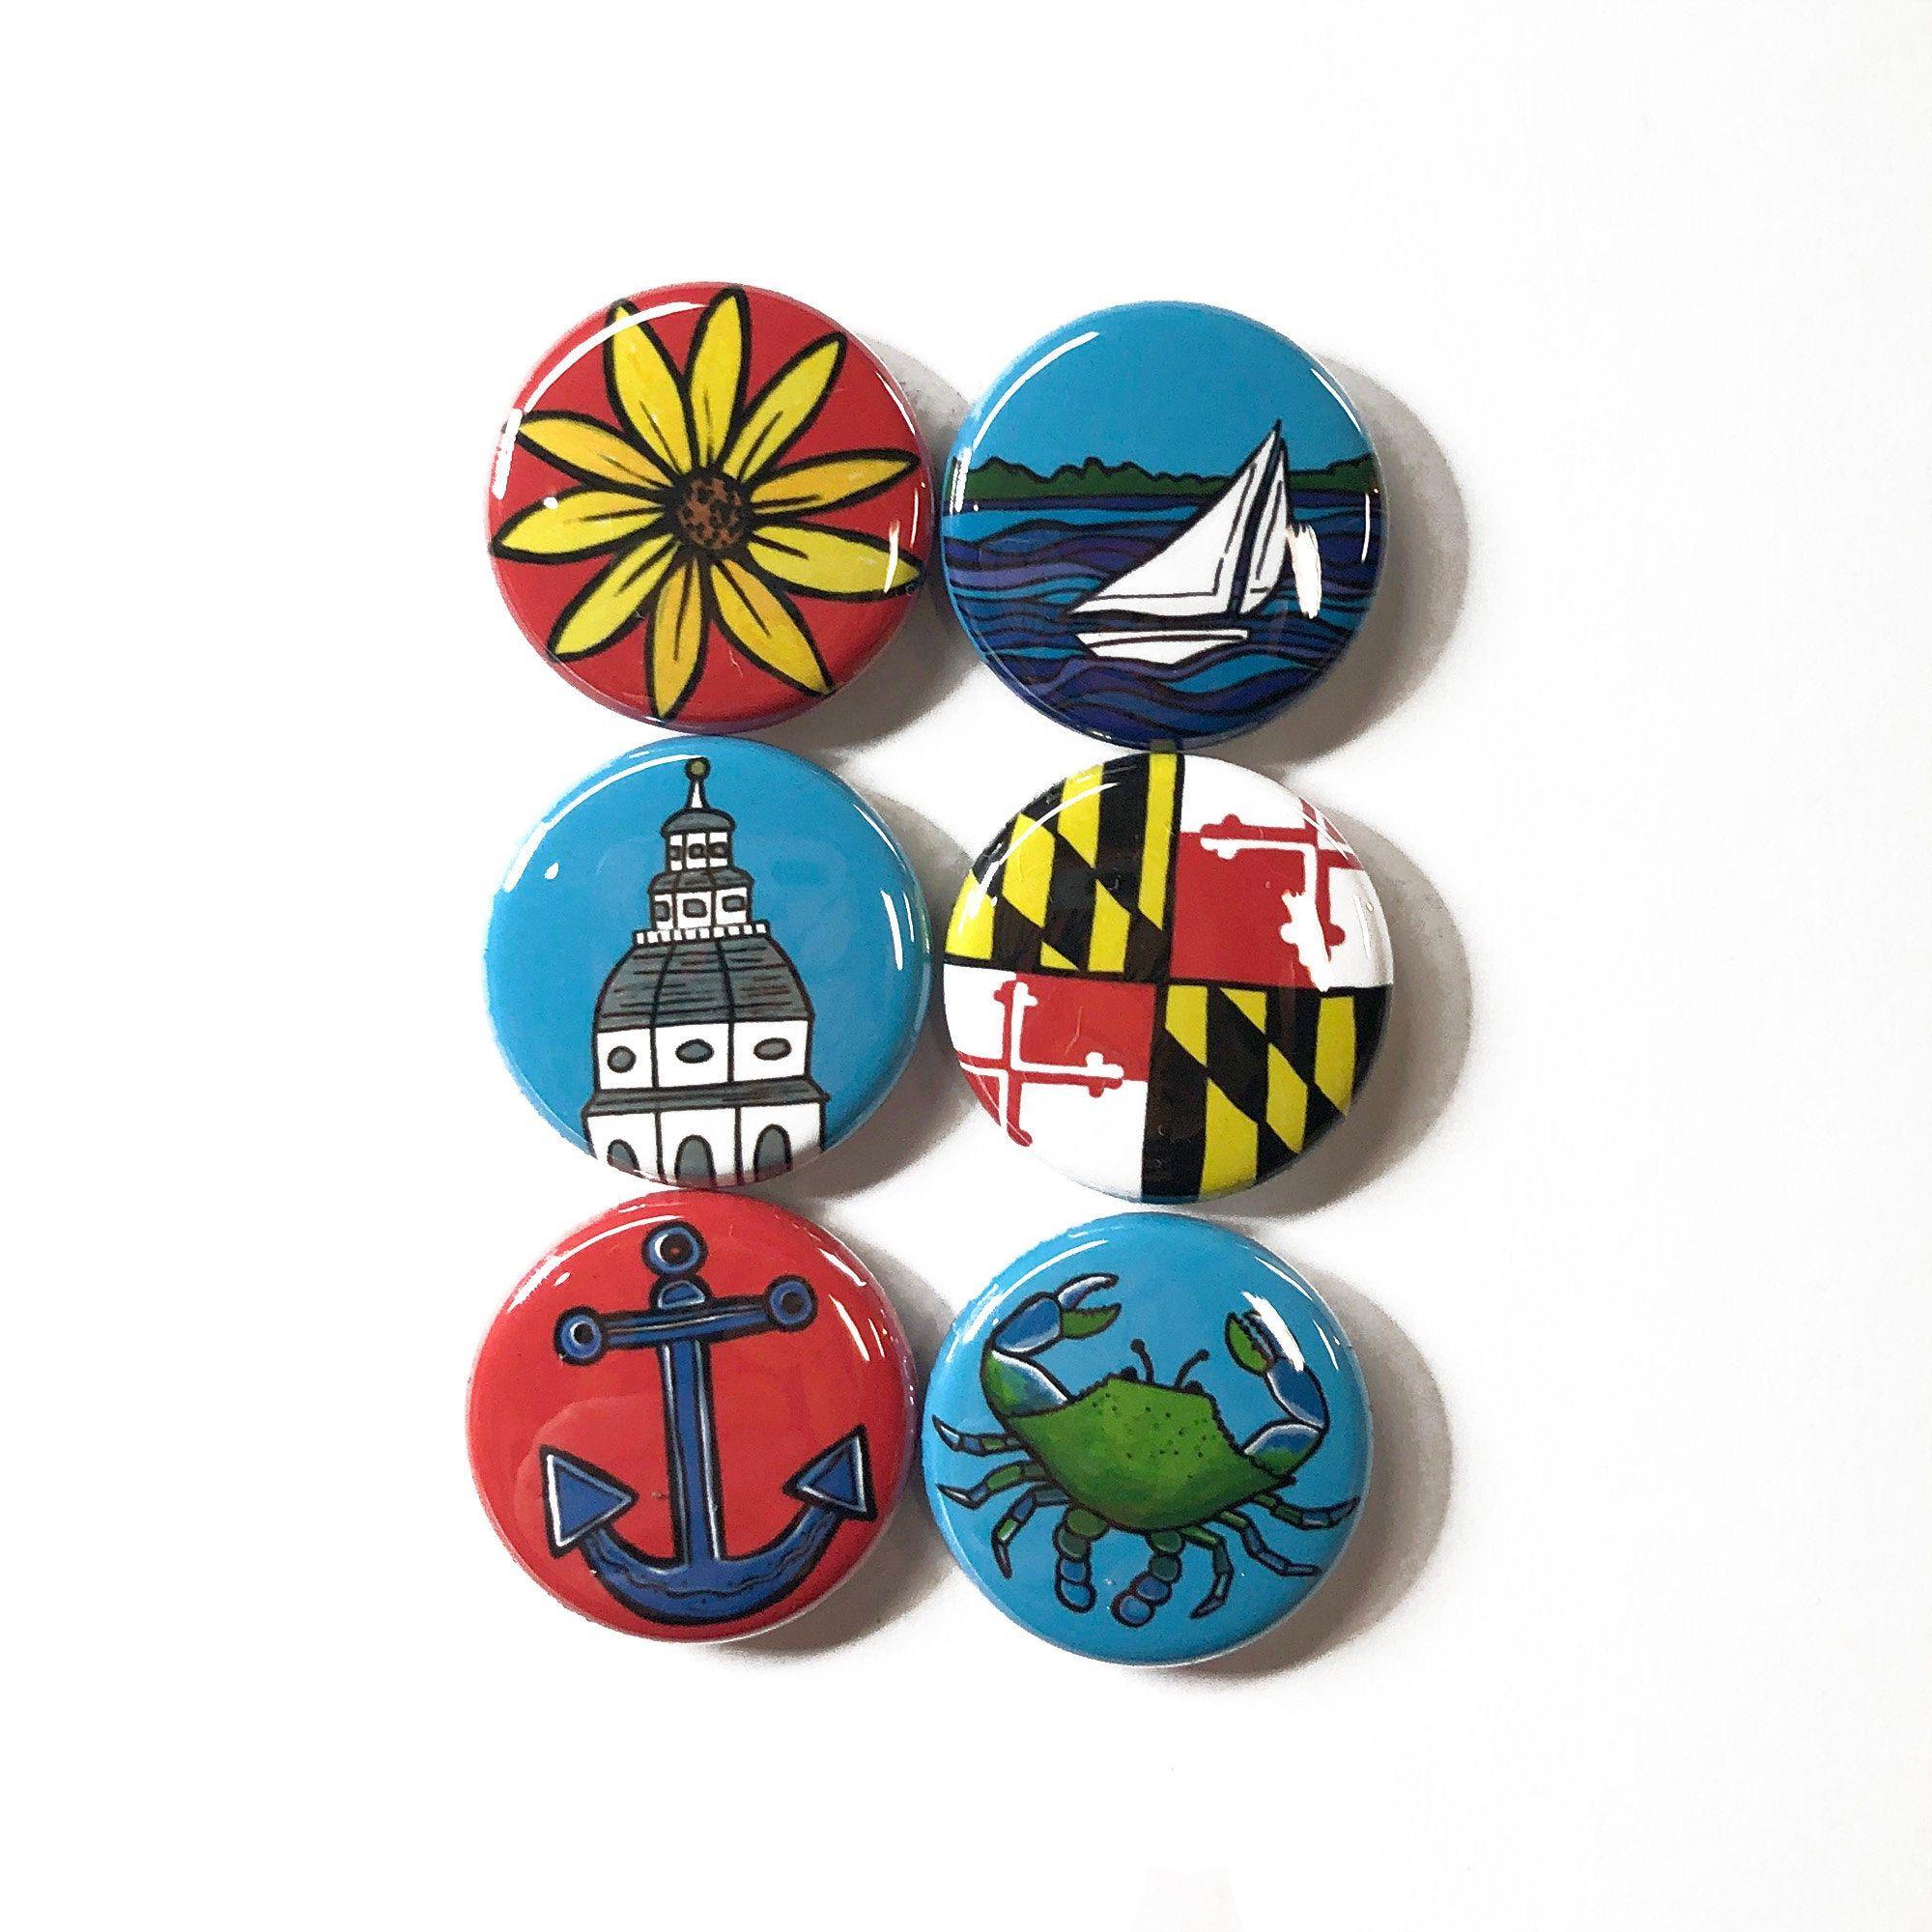 colorful  eye 2.25 inch Inspiring Art pin back button